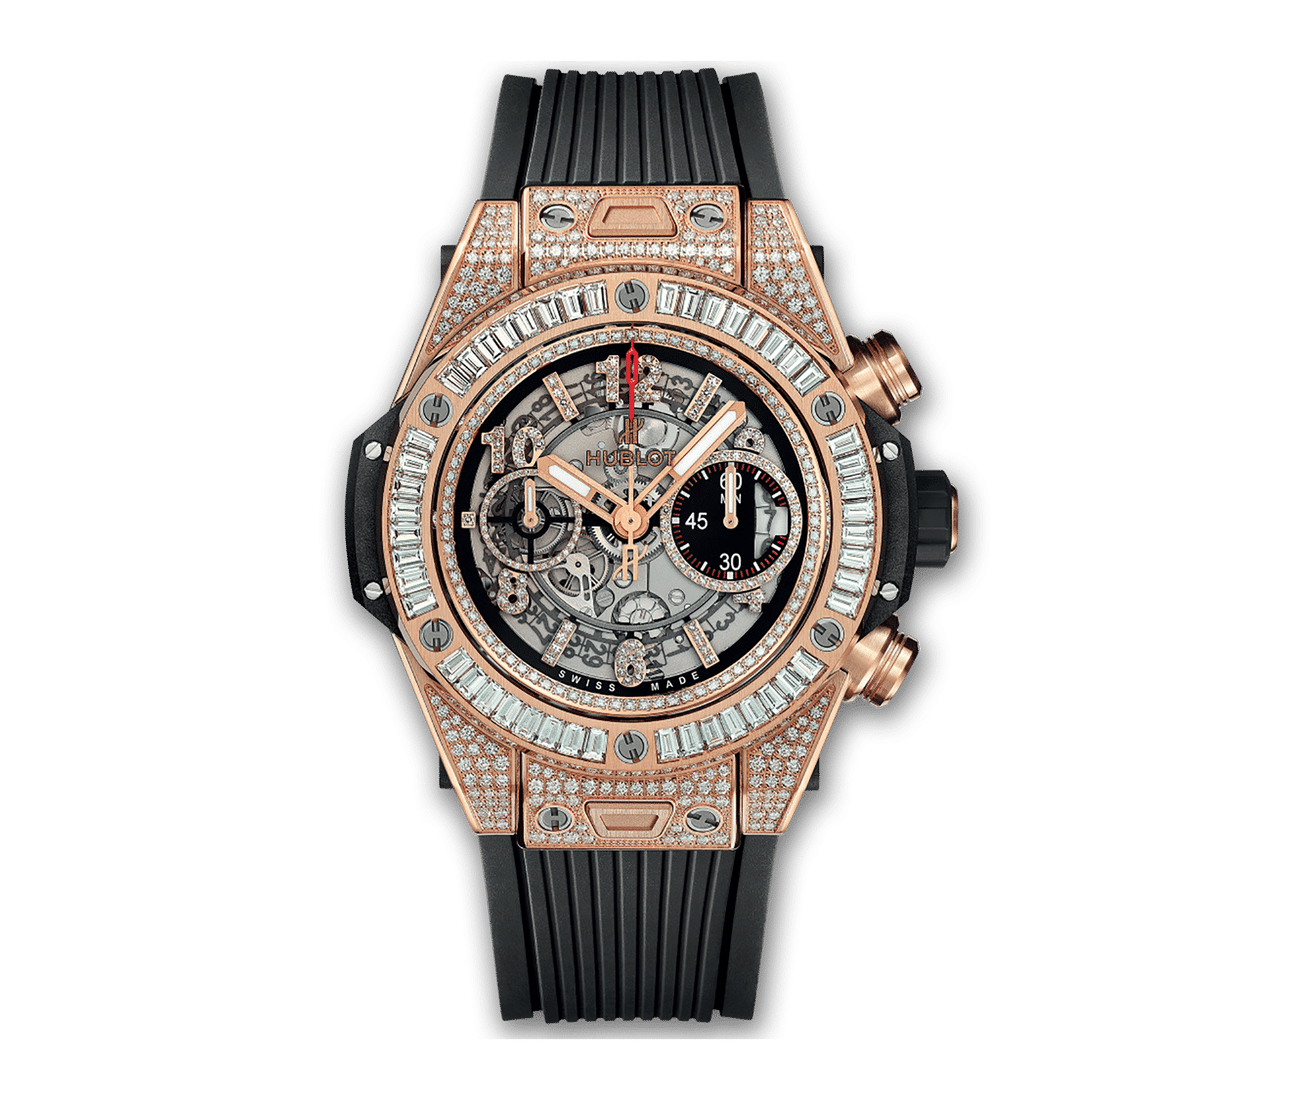 Big Bang Unico King Gold Jewellery